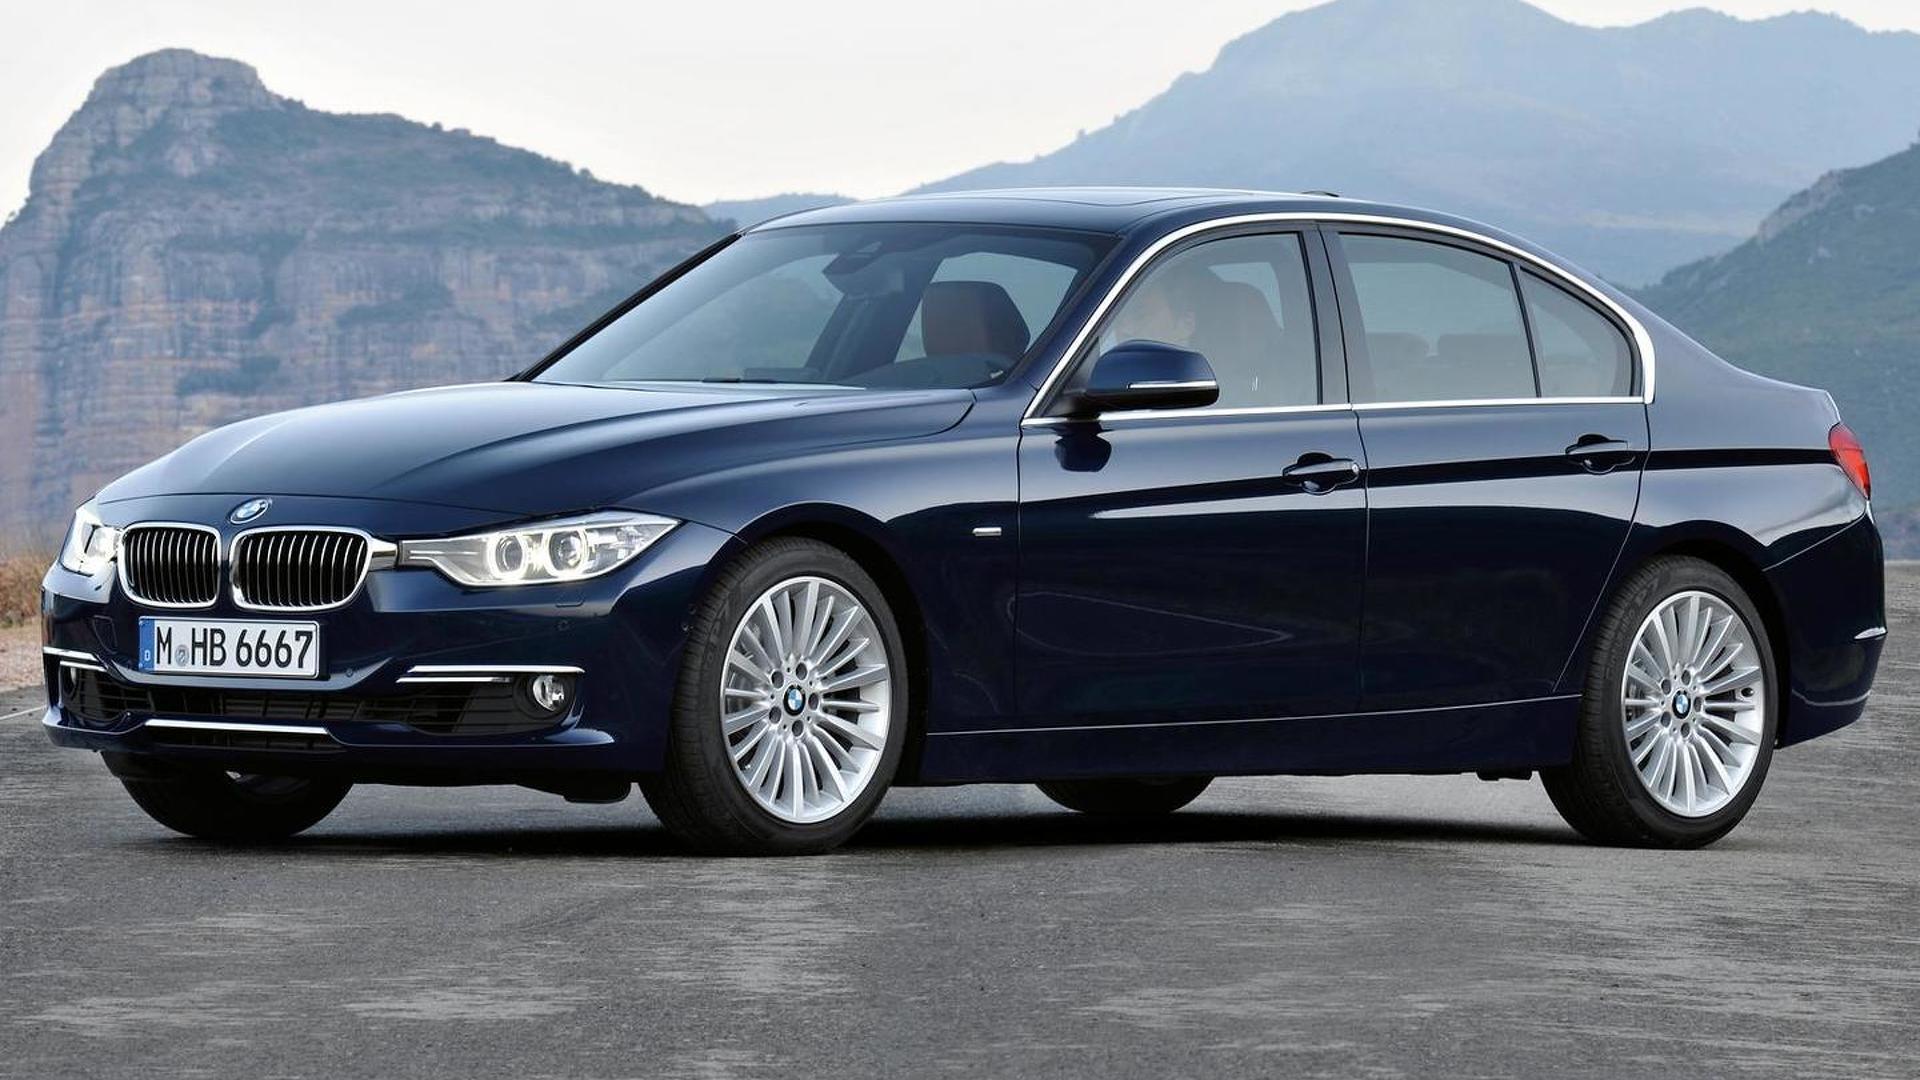 BMW I EfficientDynamics I Series XDrive Announced - Bmw 3 series turbo diesel